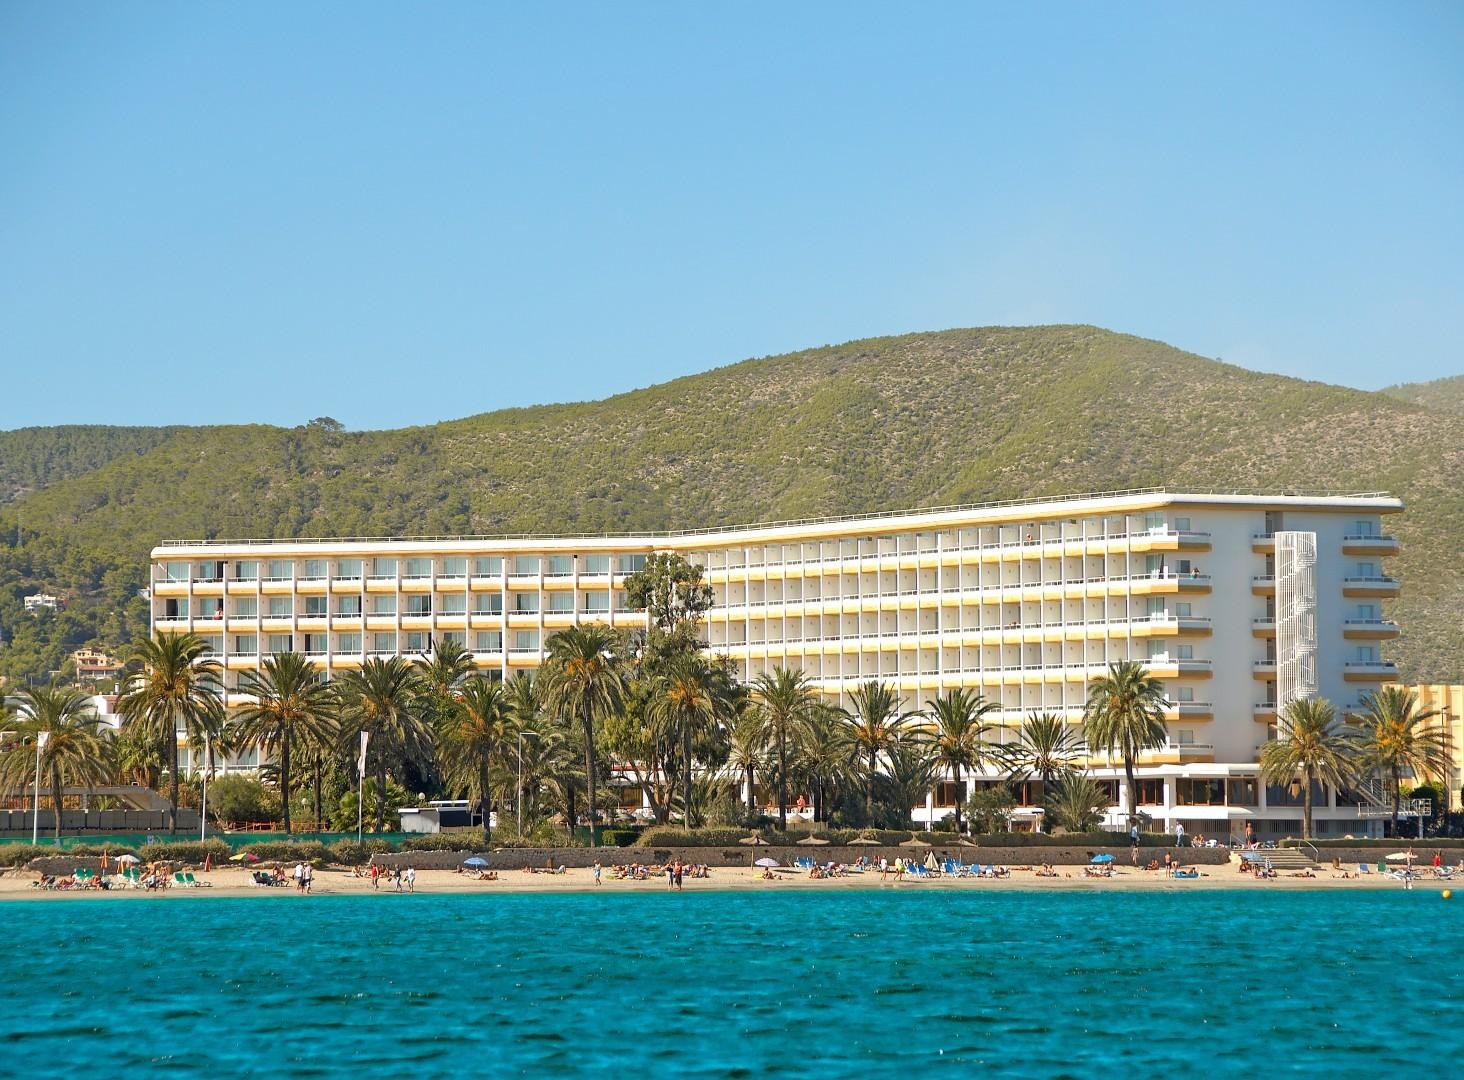 Ibiza Karte Playa D En Bossa.Book Hotels In Platja D En Bossa Sant Josep De Sa Talaia For A Good